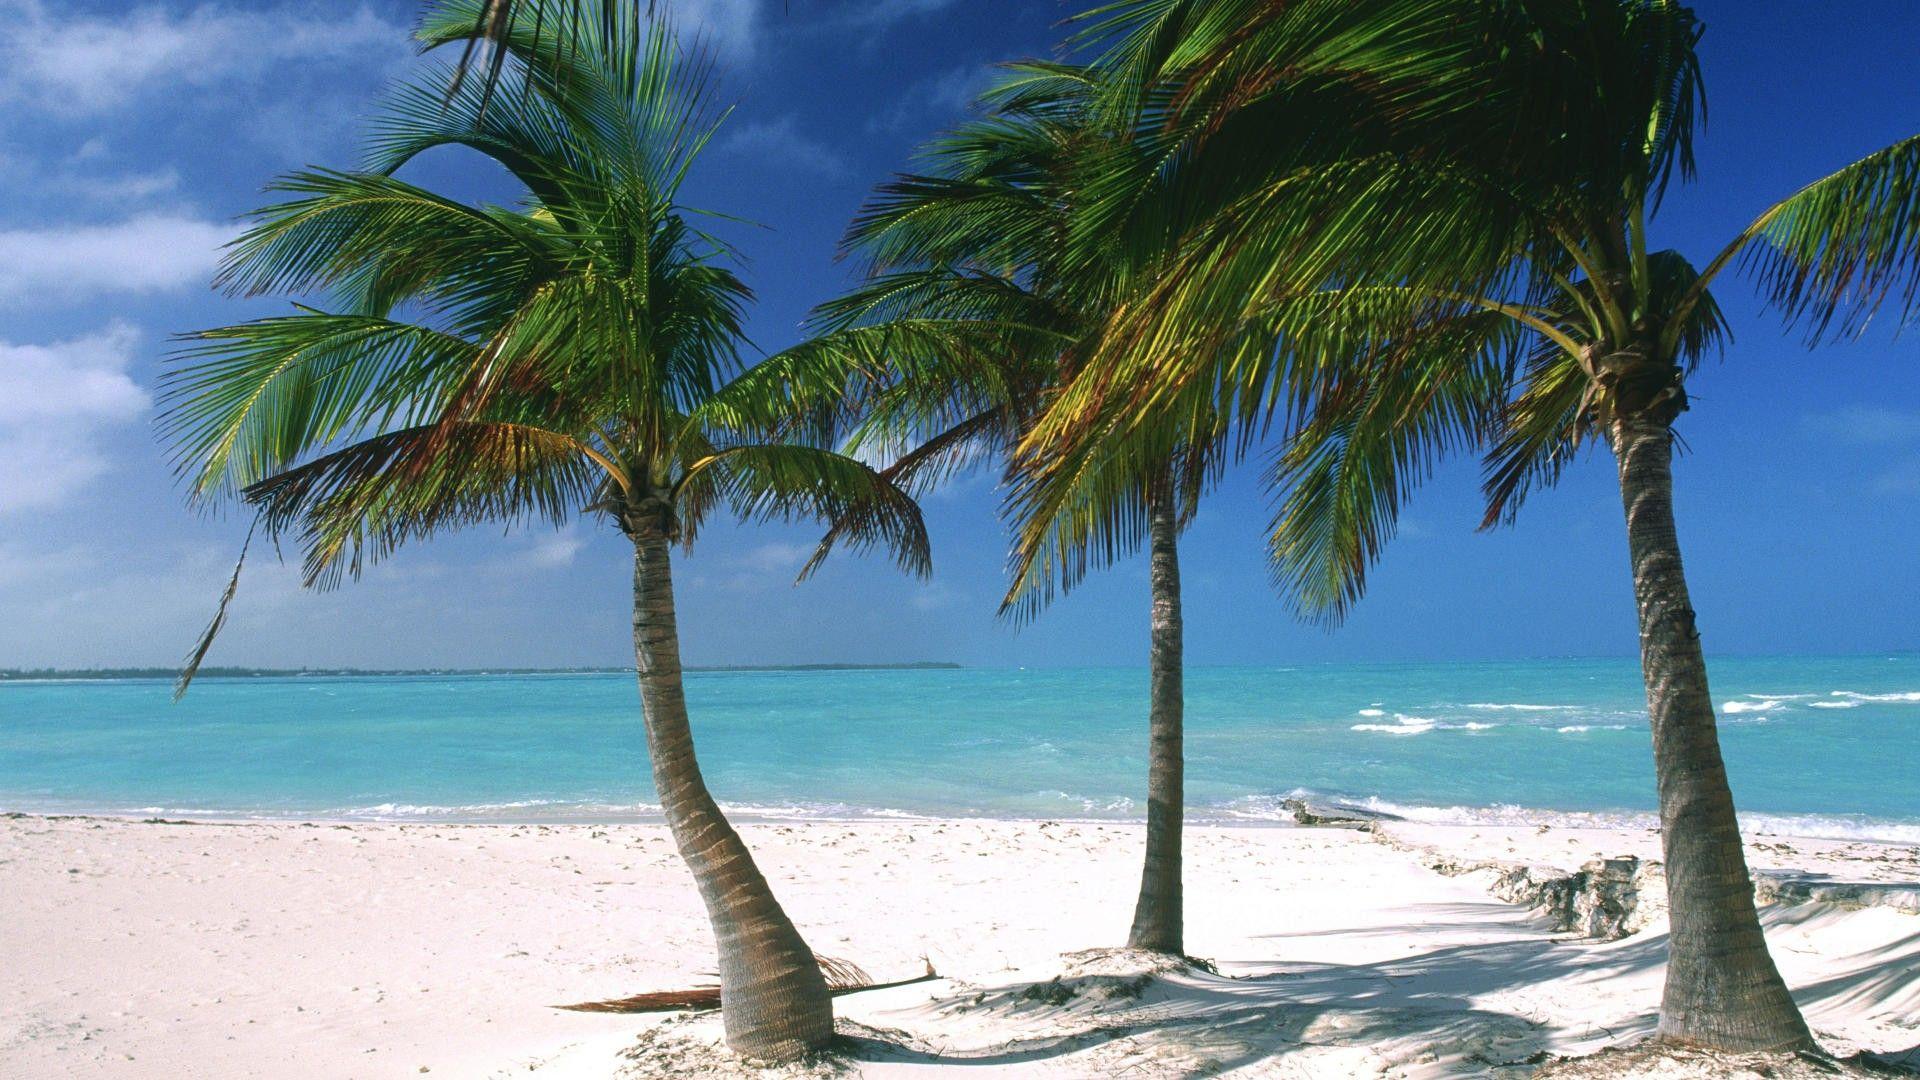 Bahamas free desktop background